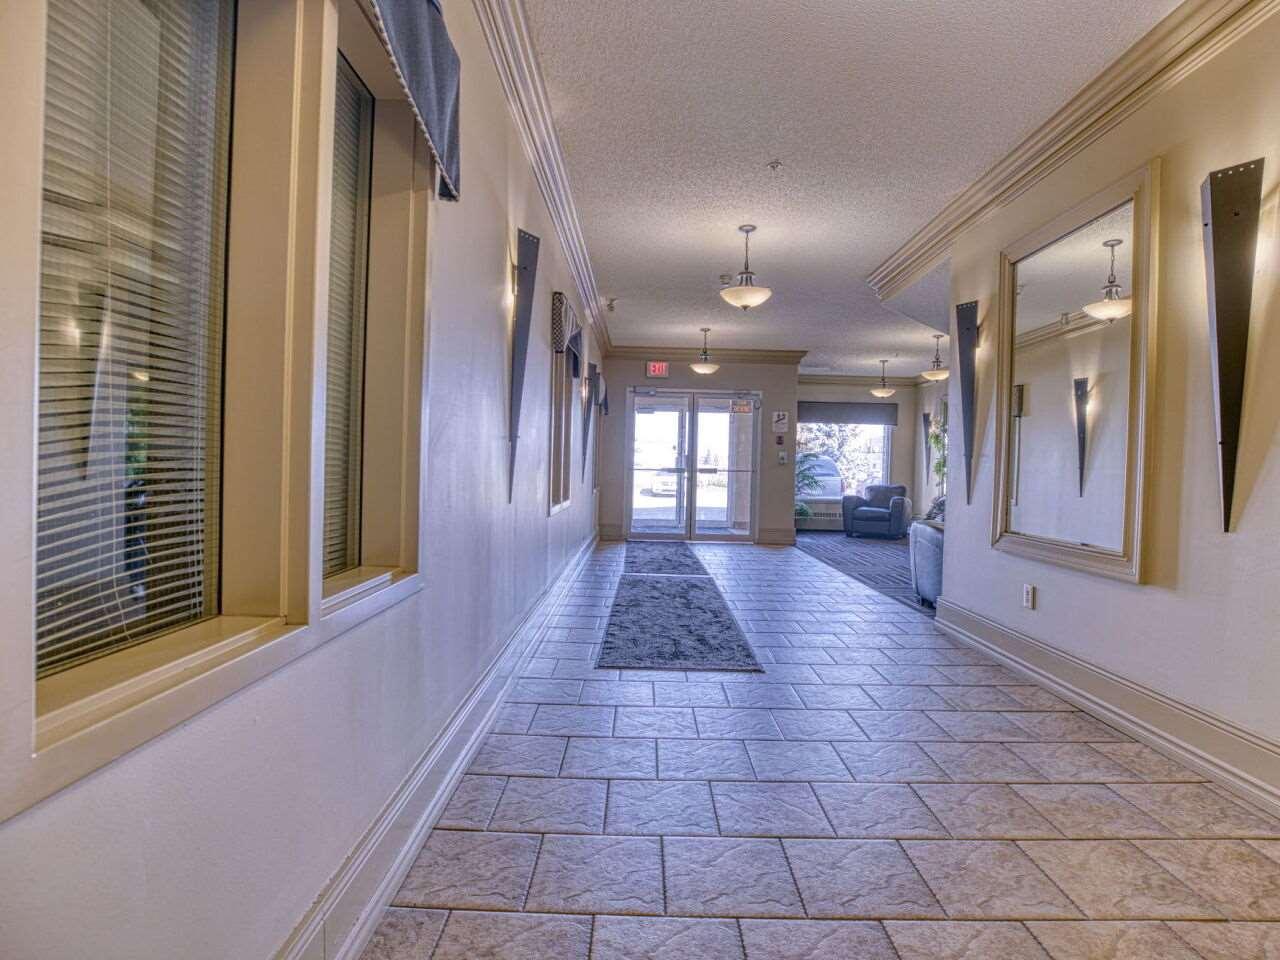 429 16807 100 Avenue - Glenwood_EDMO Lowrise Apartment for sale, 2 Bedrooms (E4234341) #5